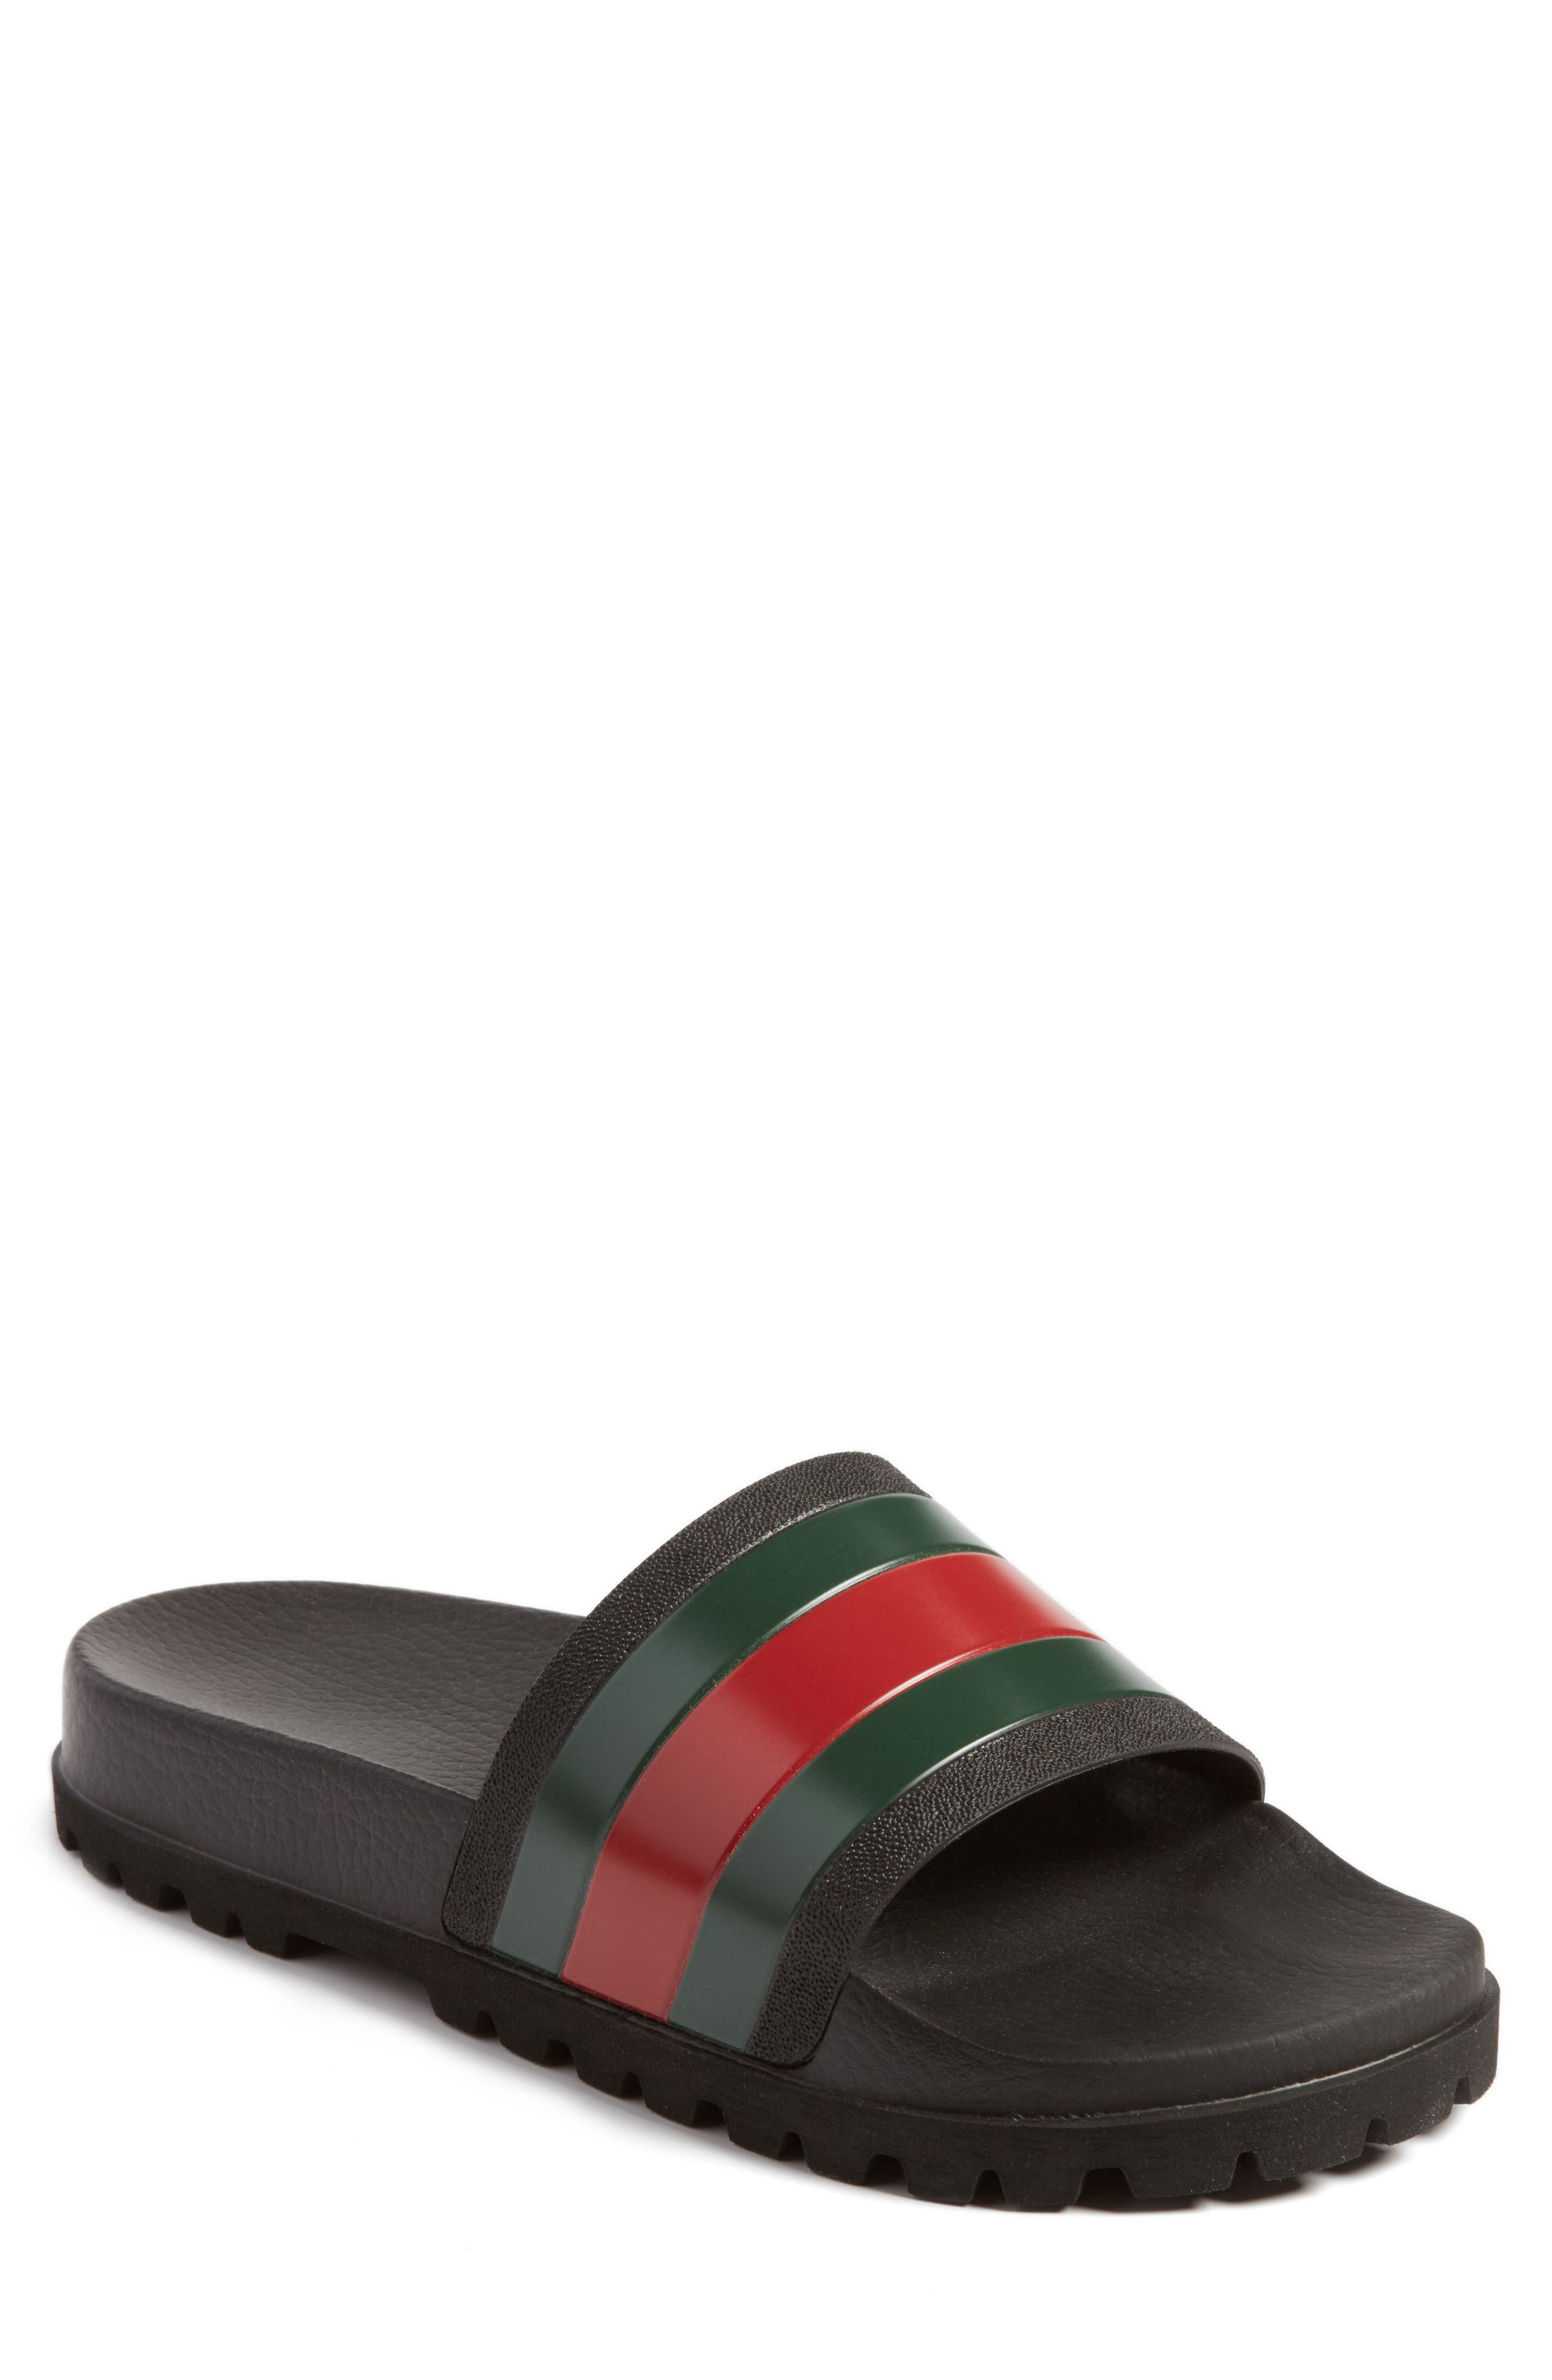 GUCCI 'Pursuit Treck' Slide Sandal, Main, color, NERO/NERO